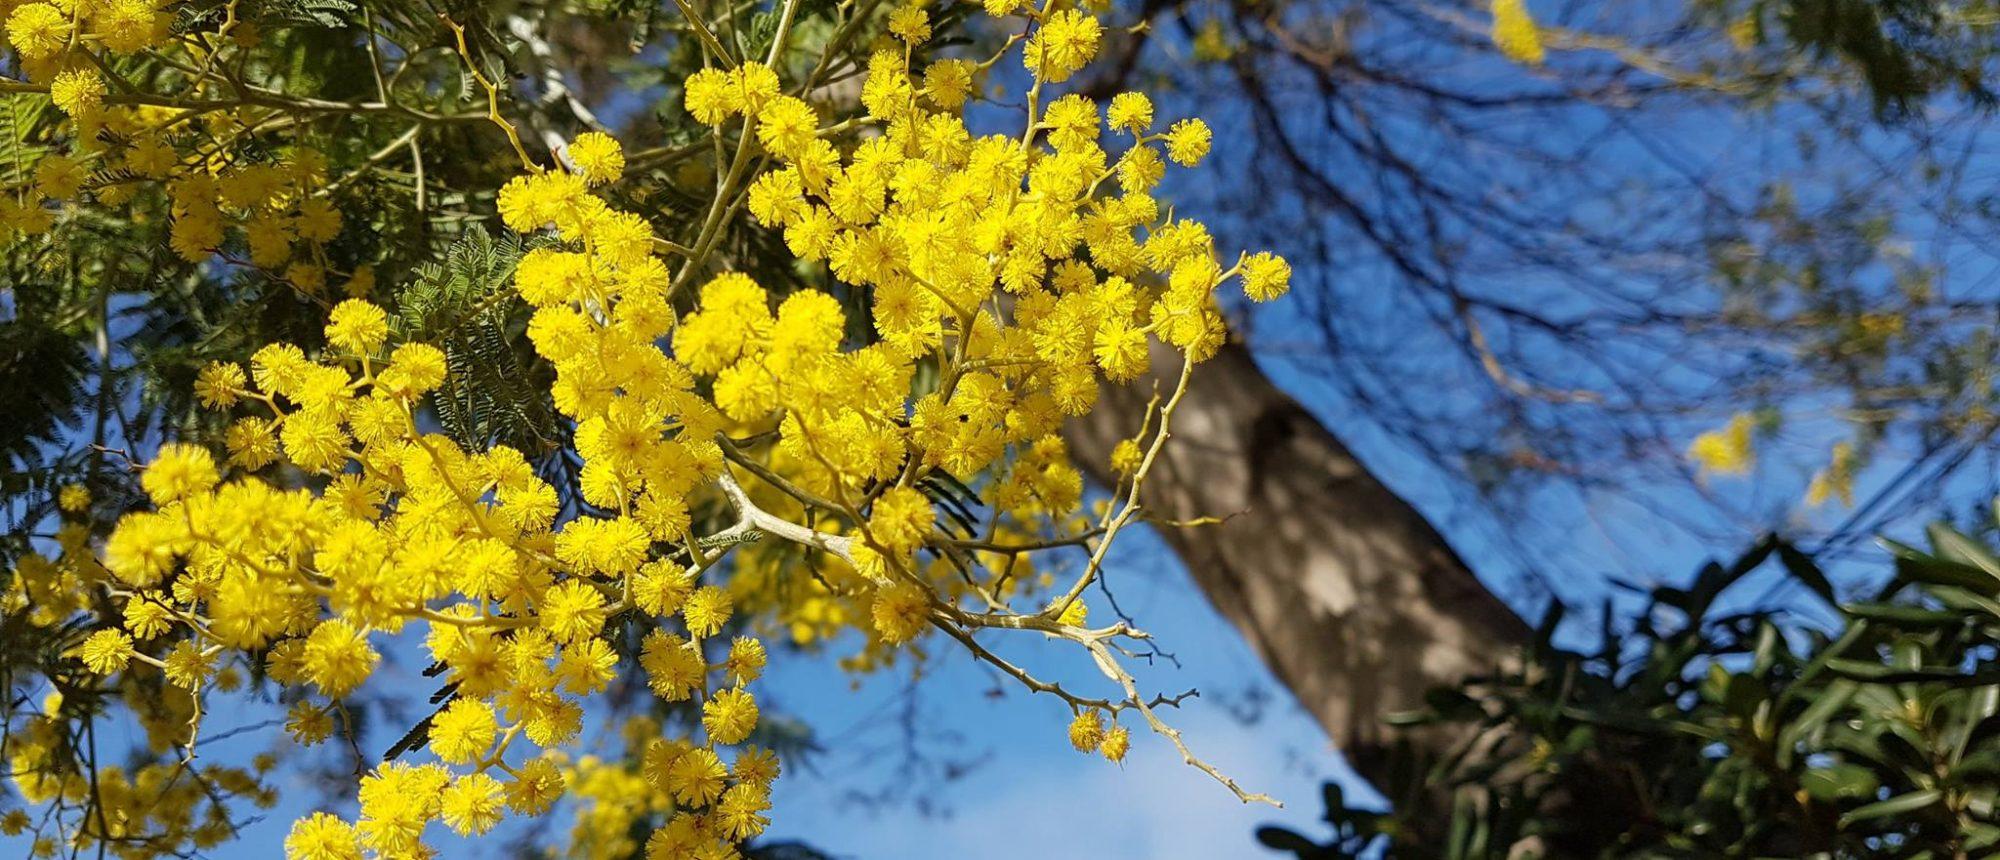 Clair De Lune : Mimosas Printemps Camping Clairdelune Vuemer Fleur